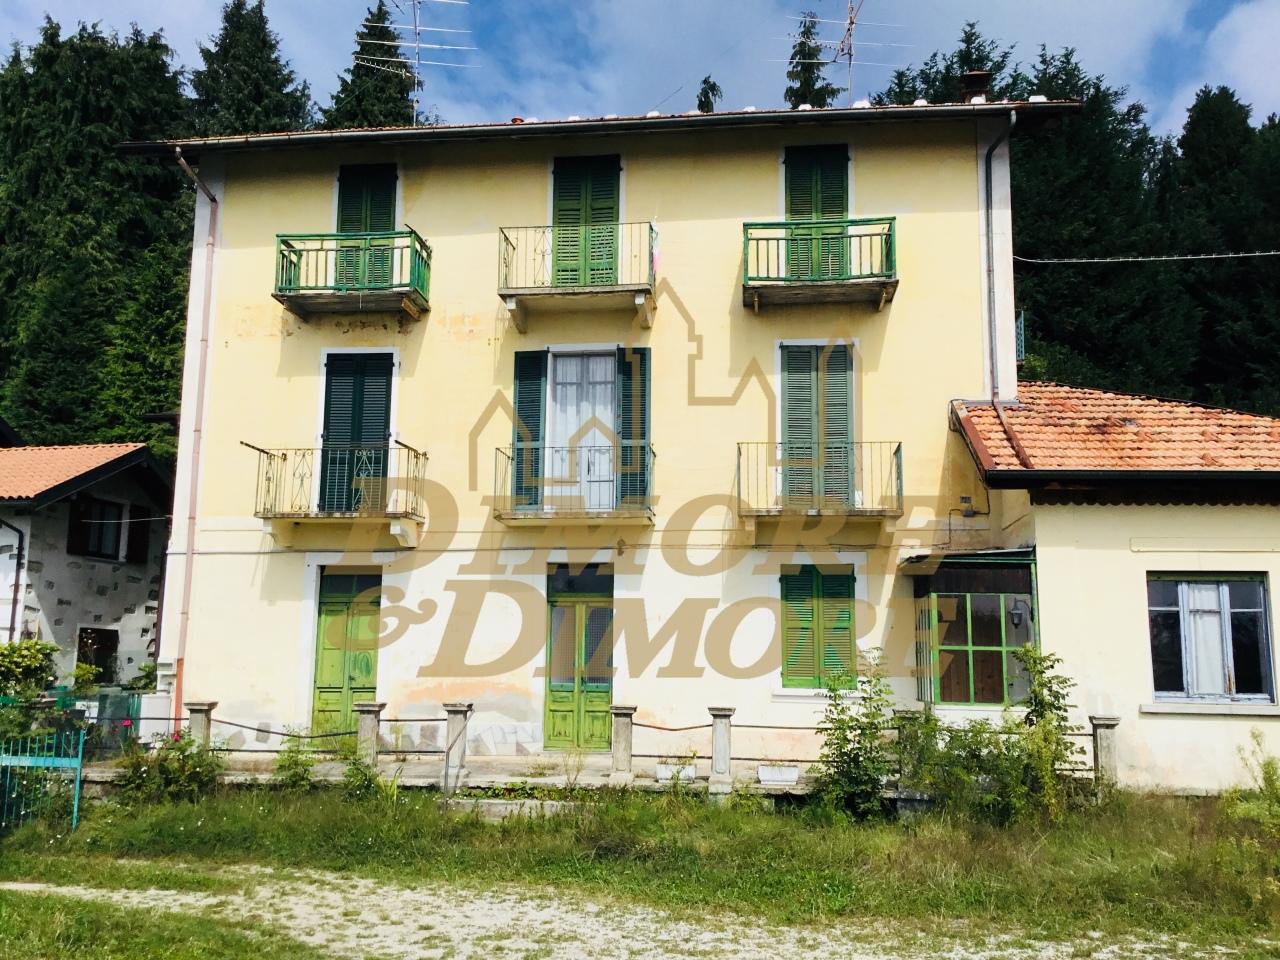 Casa Indipendente in discrete condizioni in vendita Rif. 4168654